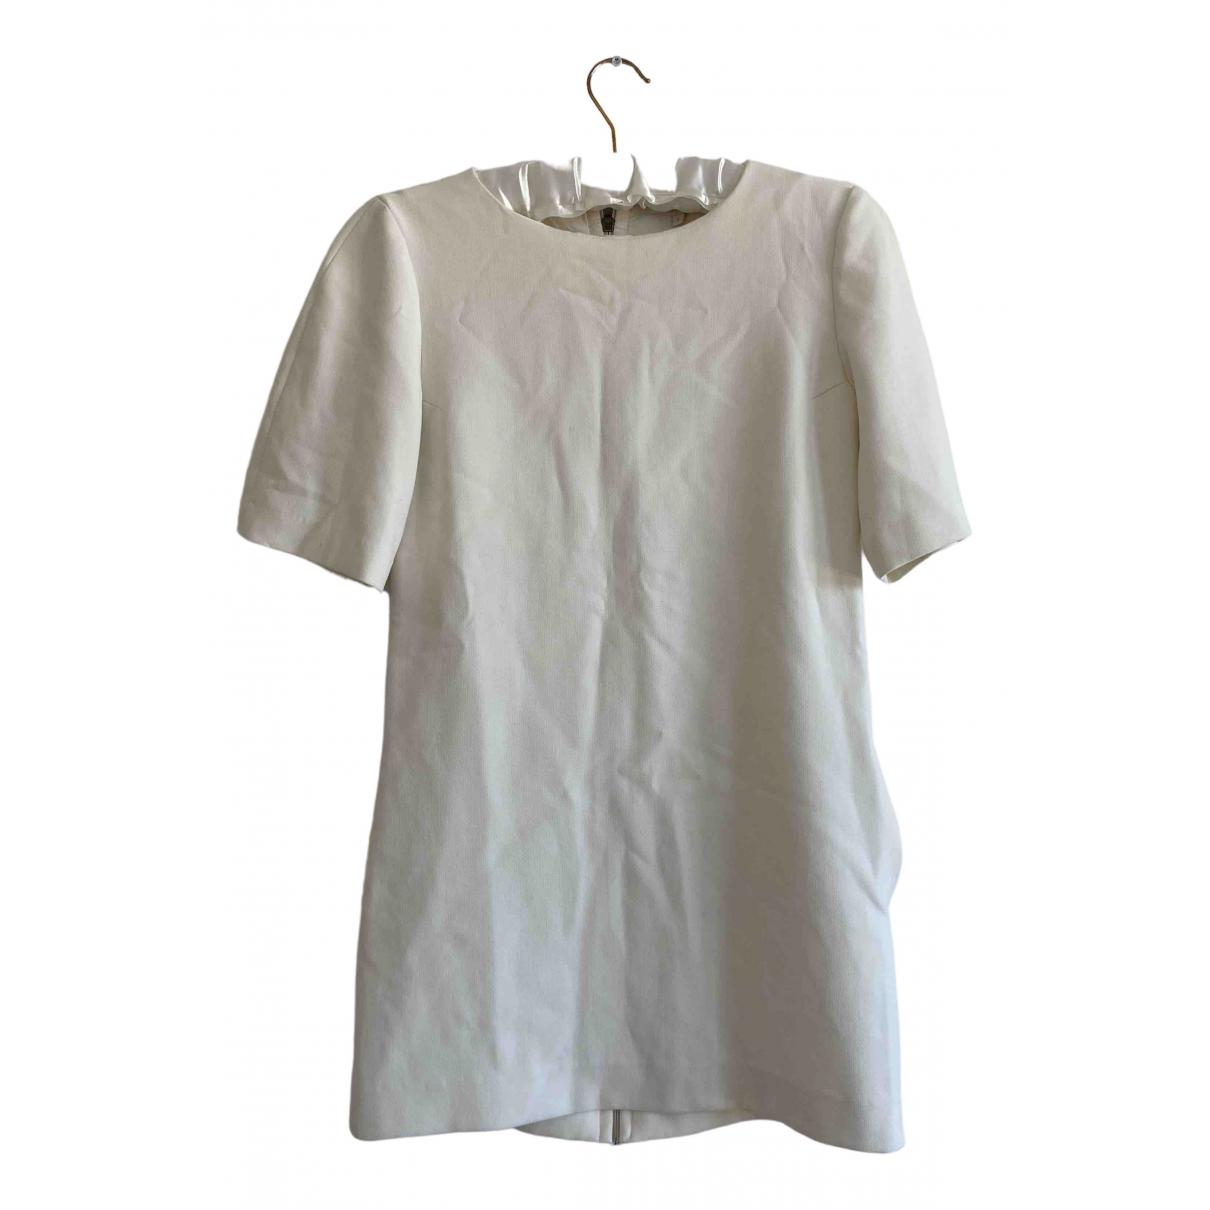 Maje \N Ecru dress for Women 1 0-5